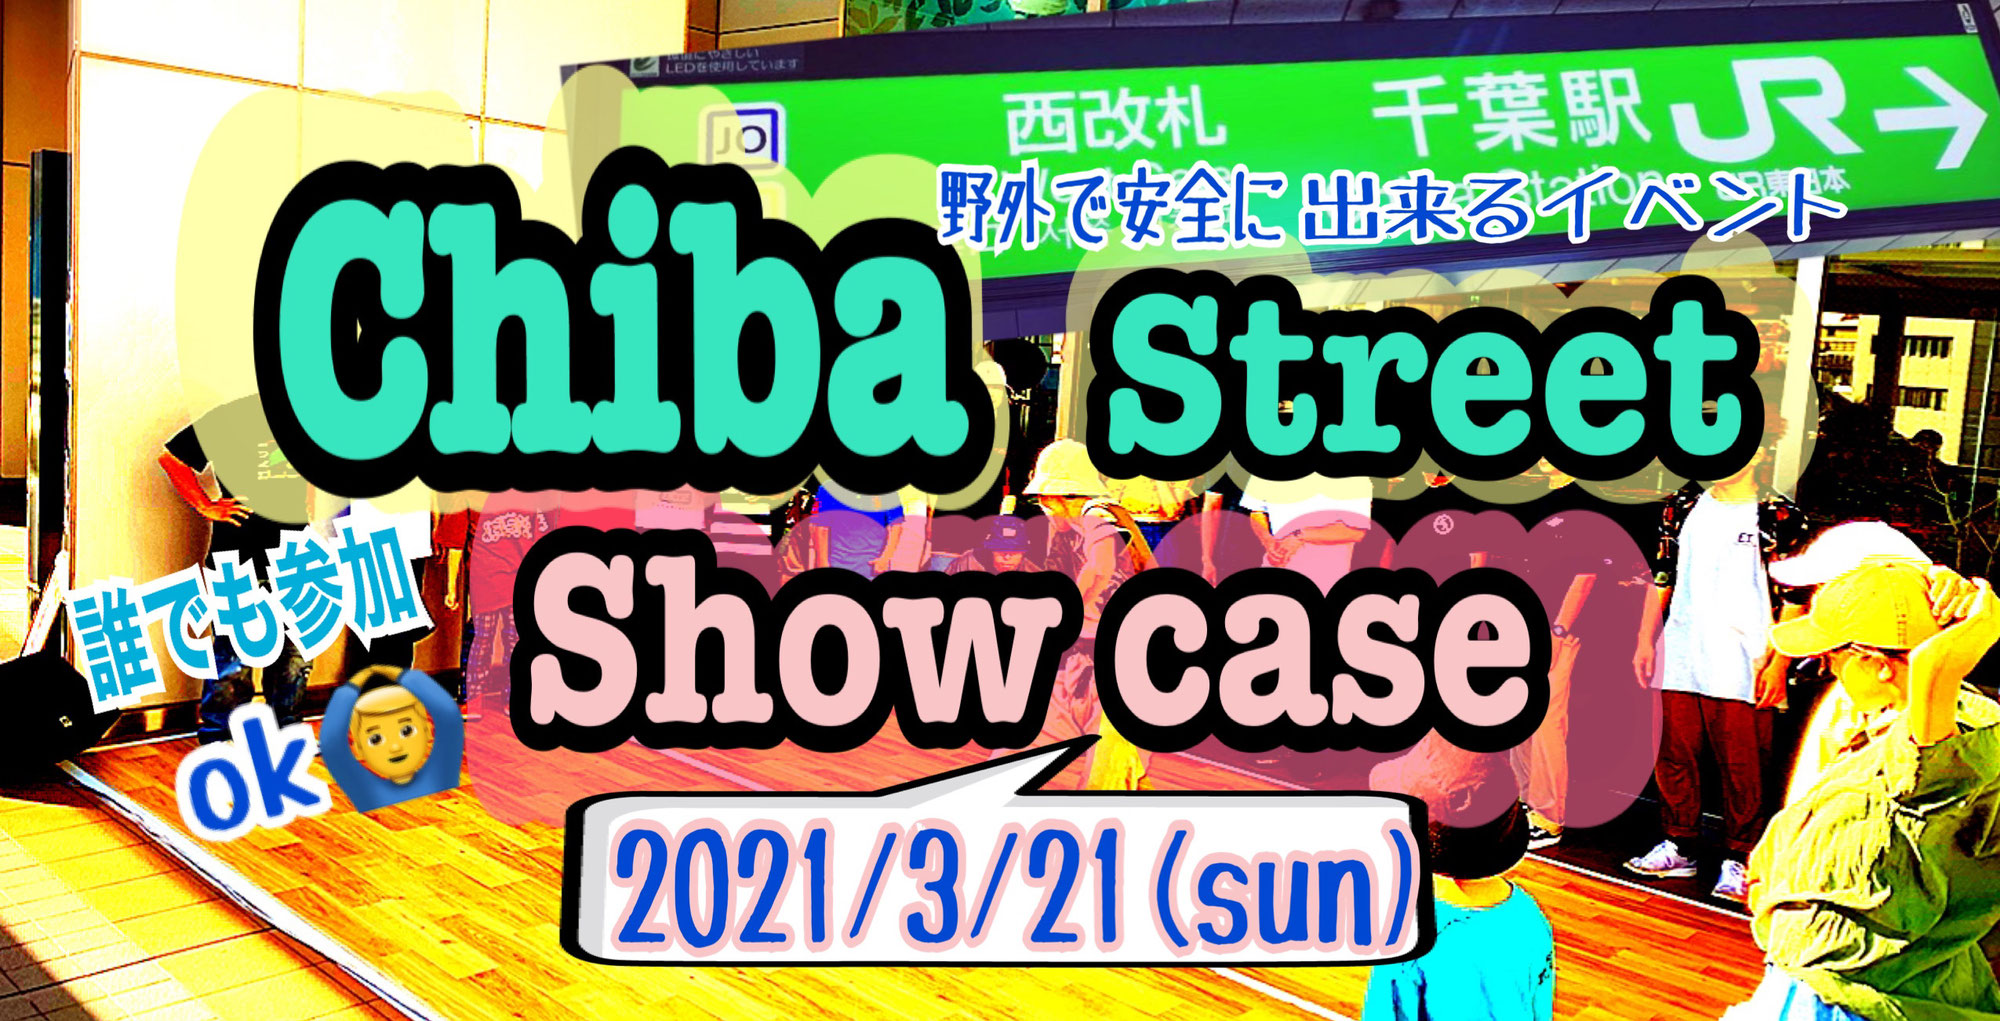 2021/3/21(sun) 千葉Street Show Case開催のお知らせ。